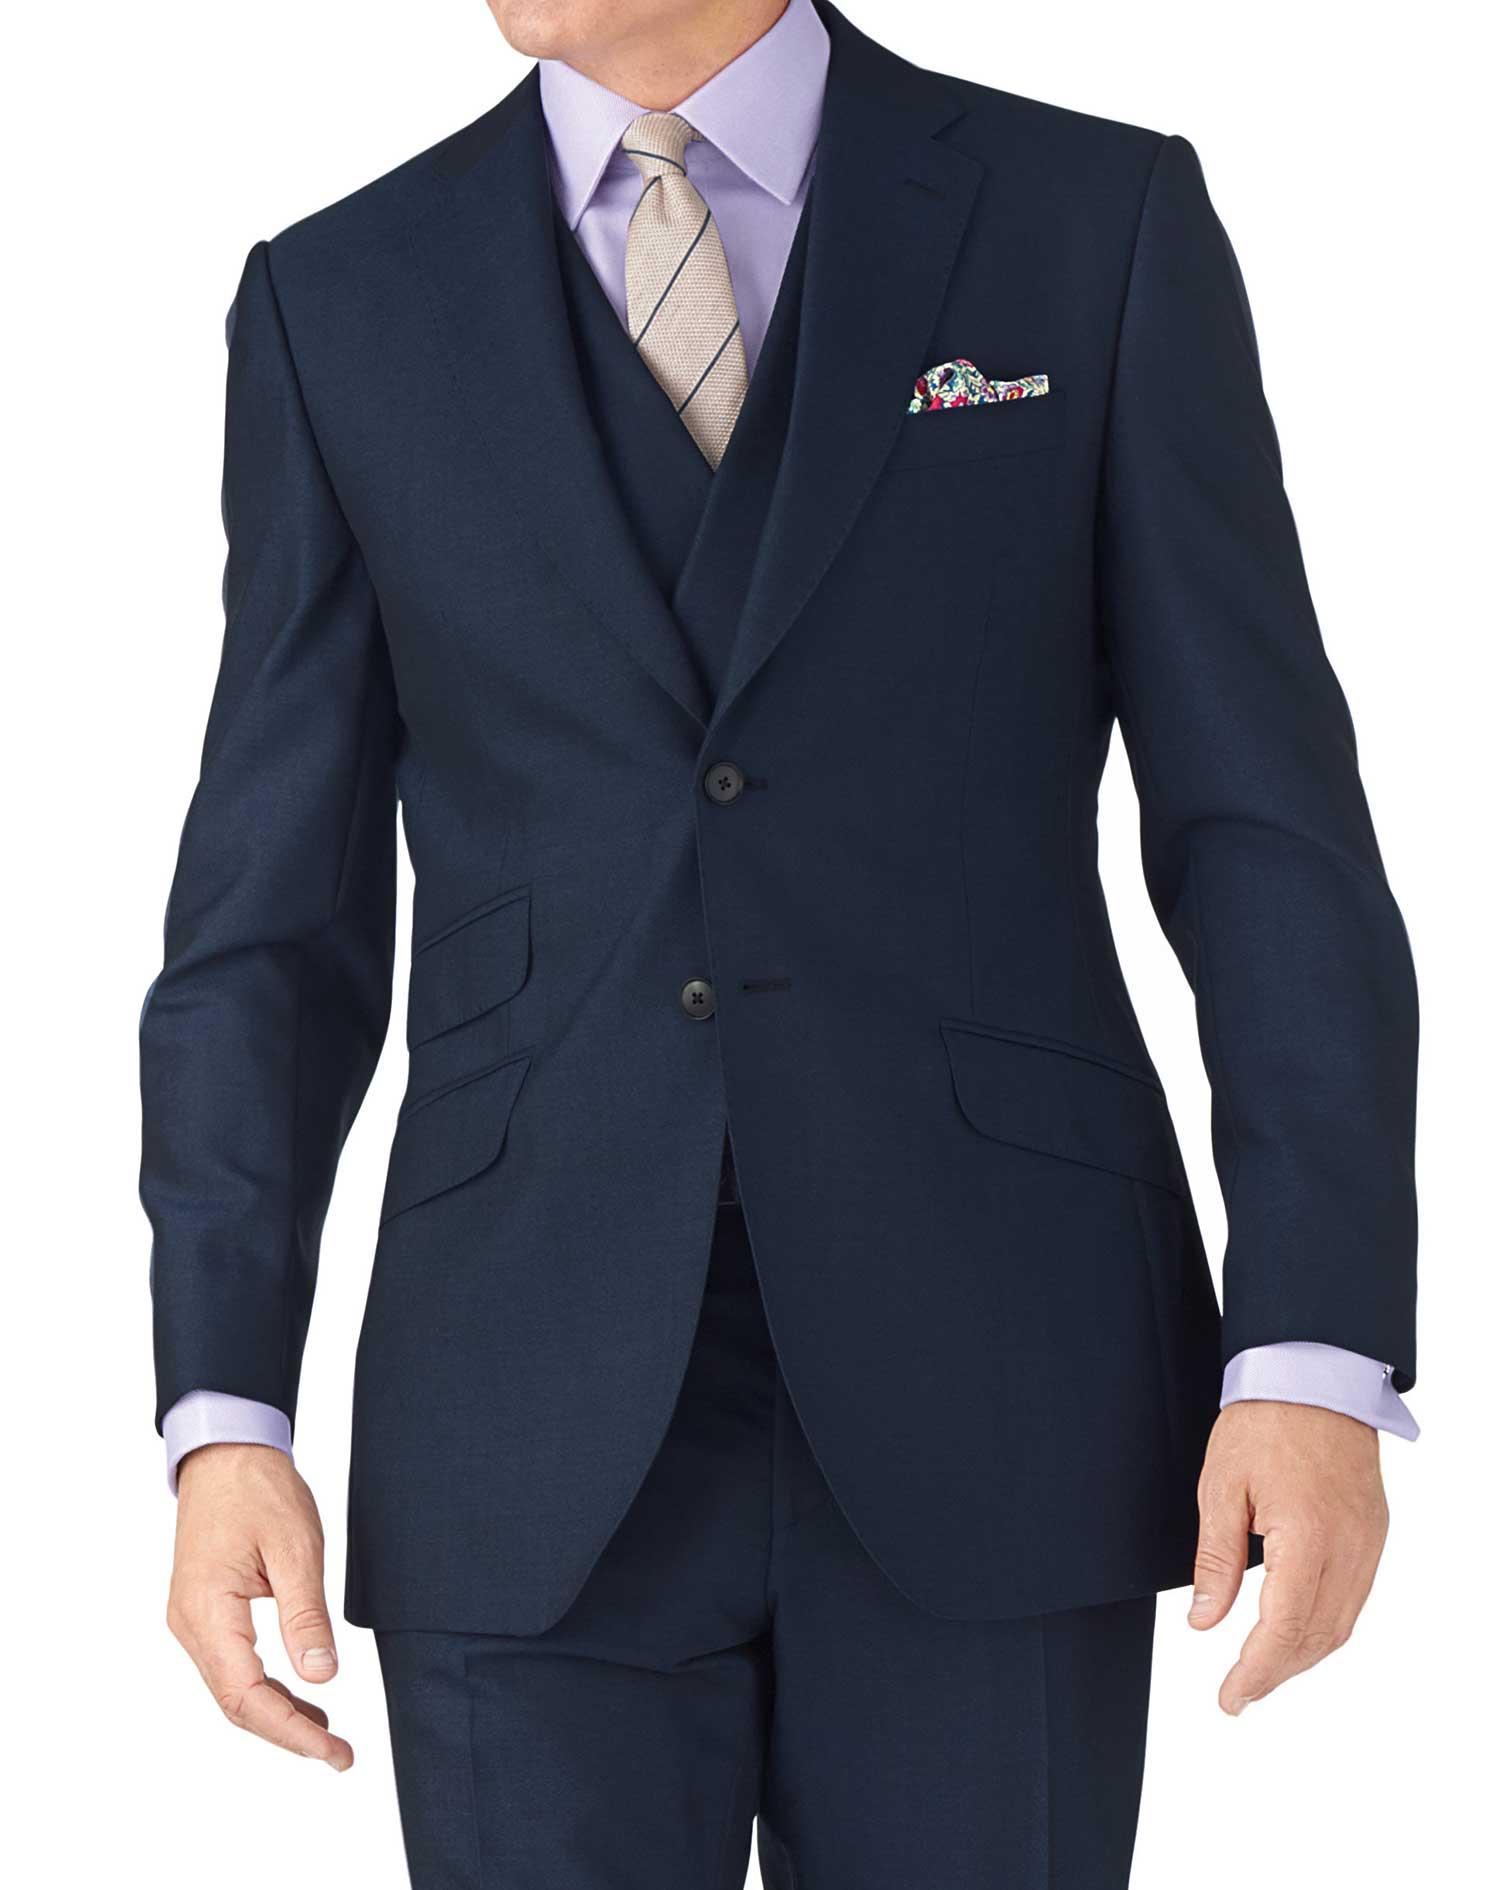 Blue Slim Fit British Panama Luxury Suit Wool Jacket Size 42 Regular by Charles Tyrwhitt